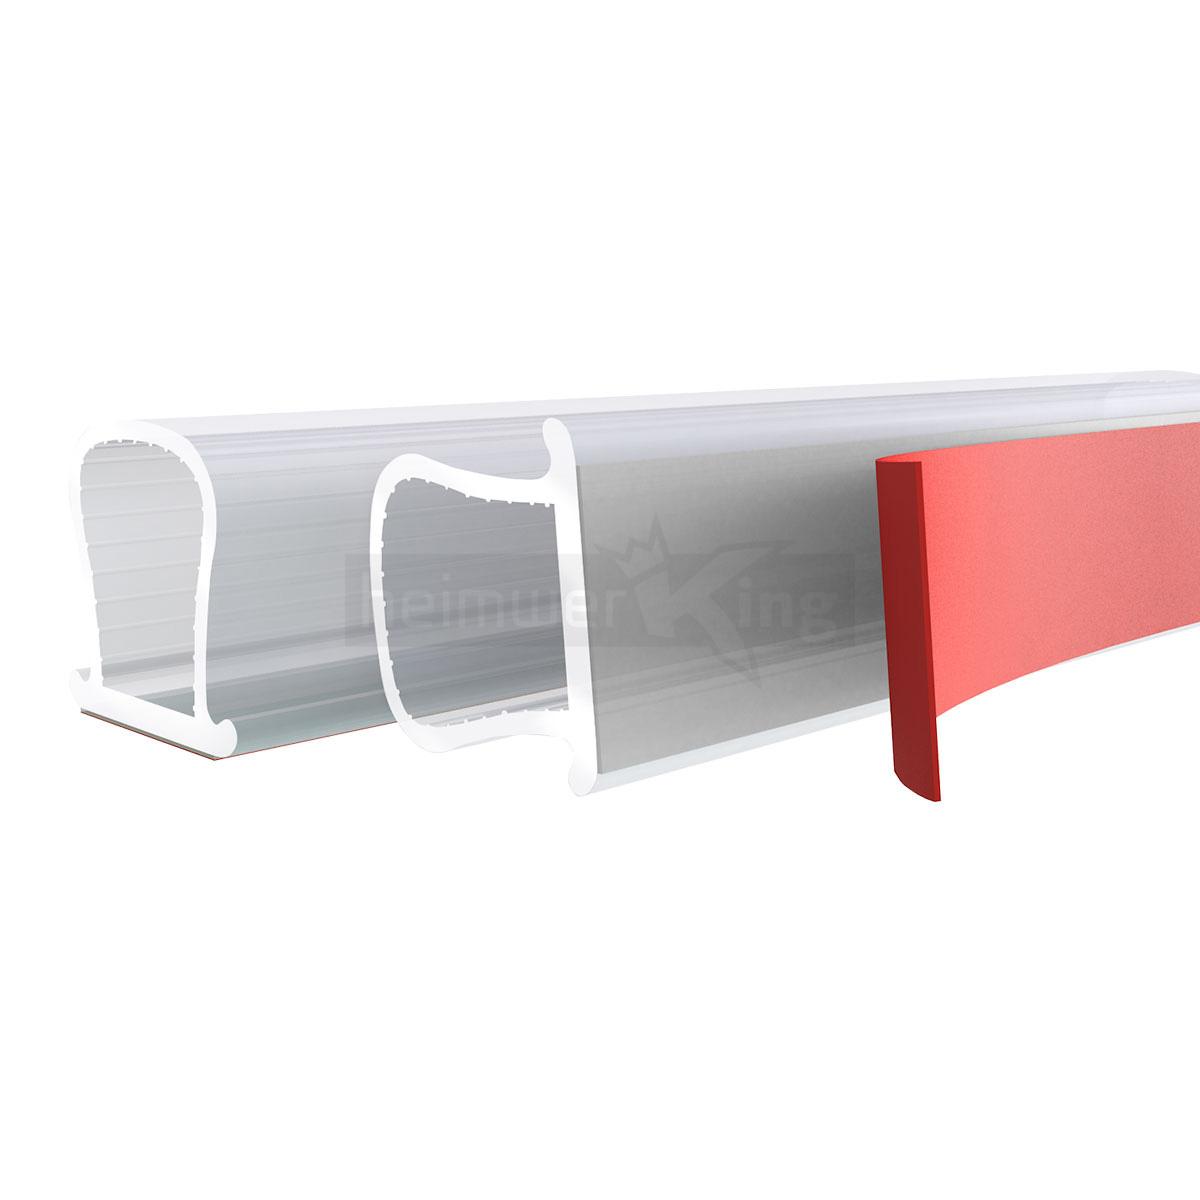 fensterdichtung gummidichtung t rdichtung selbstklebend dichtung zimmerdichtung ebay. Black Bedroom Furniture Sets. Home Design Ideas